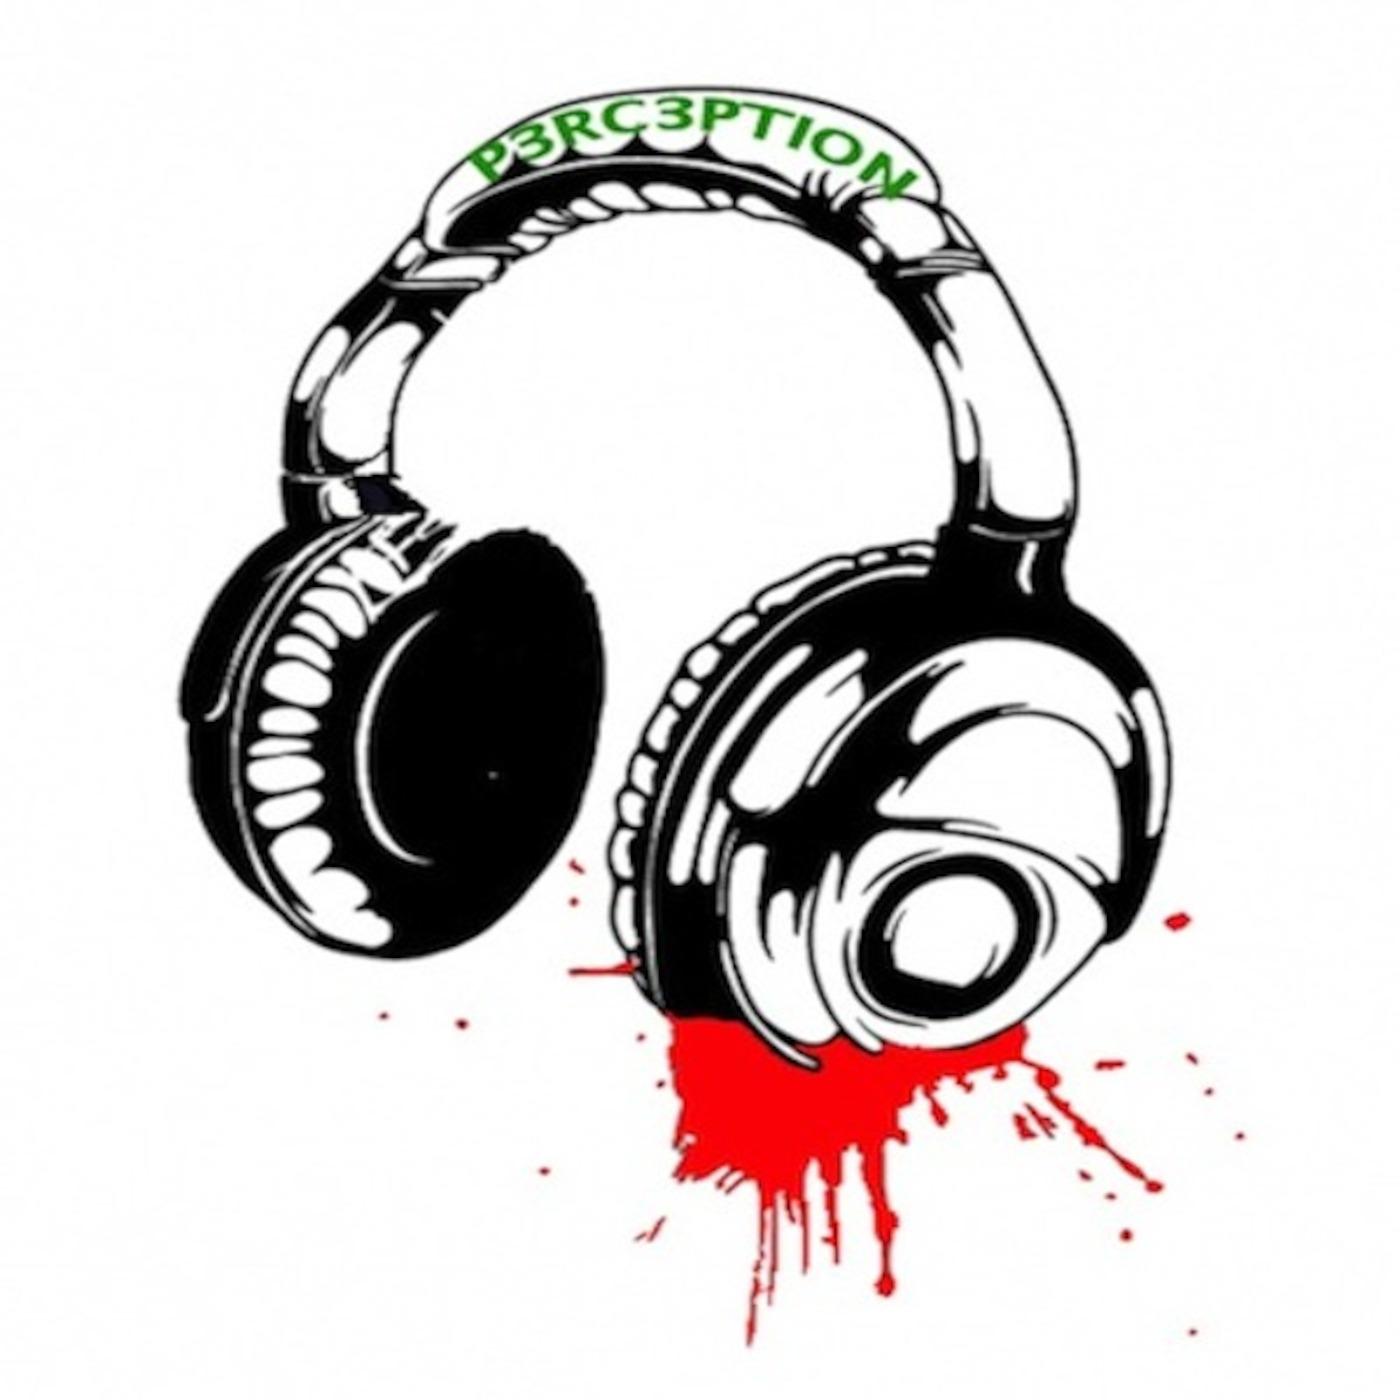 Dj P3RC3PTION's Podcast